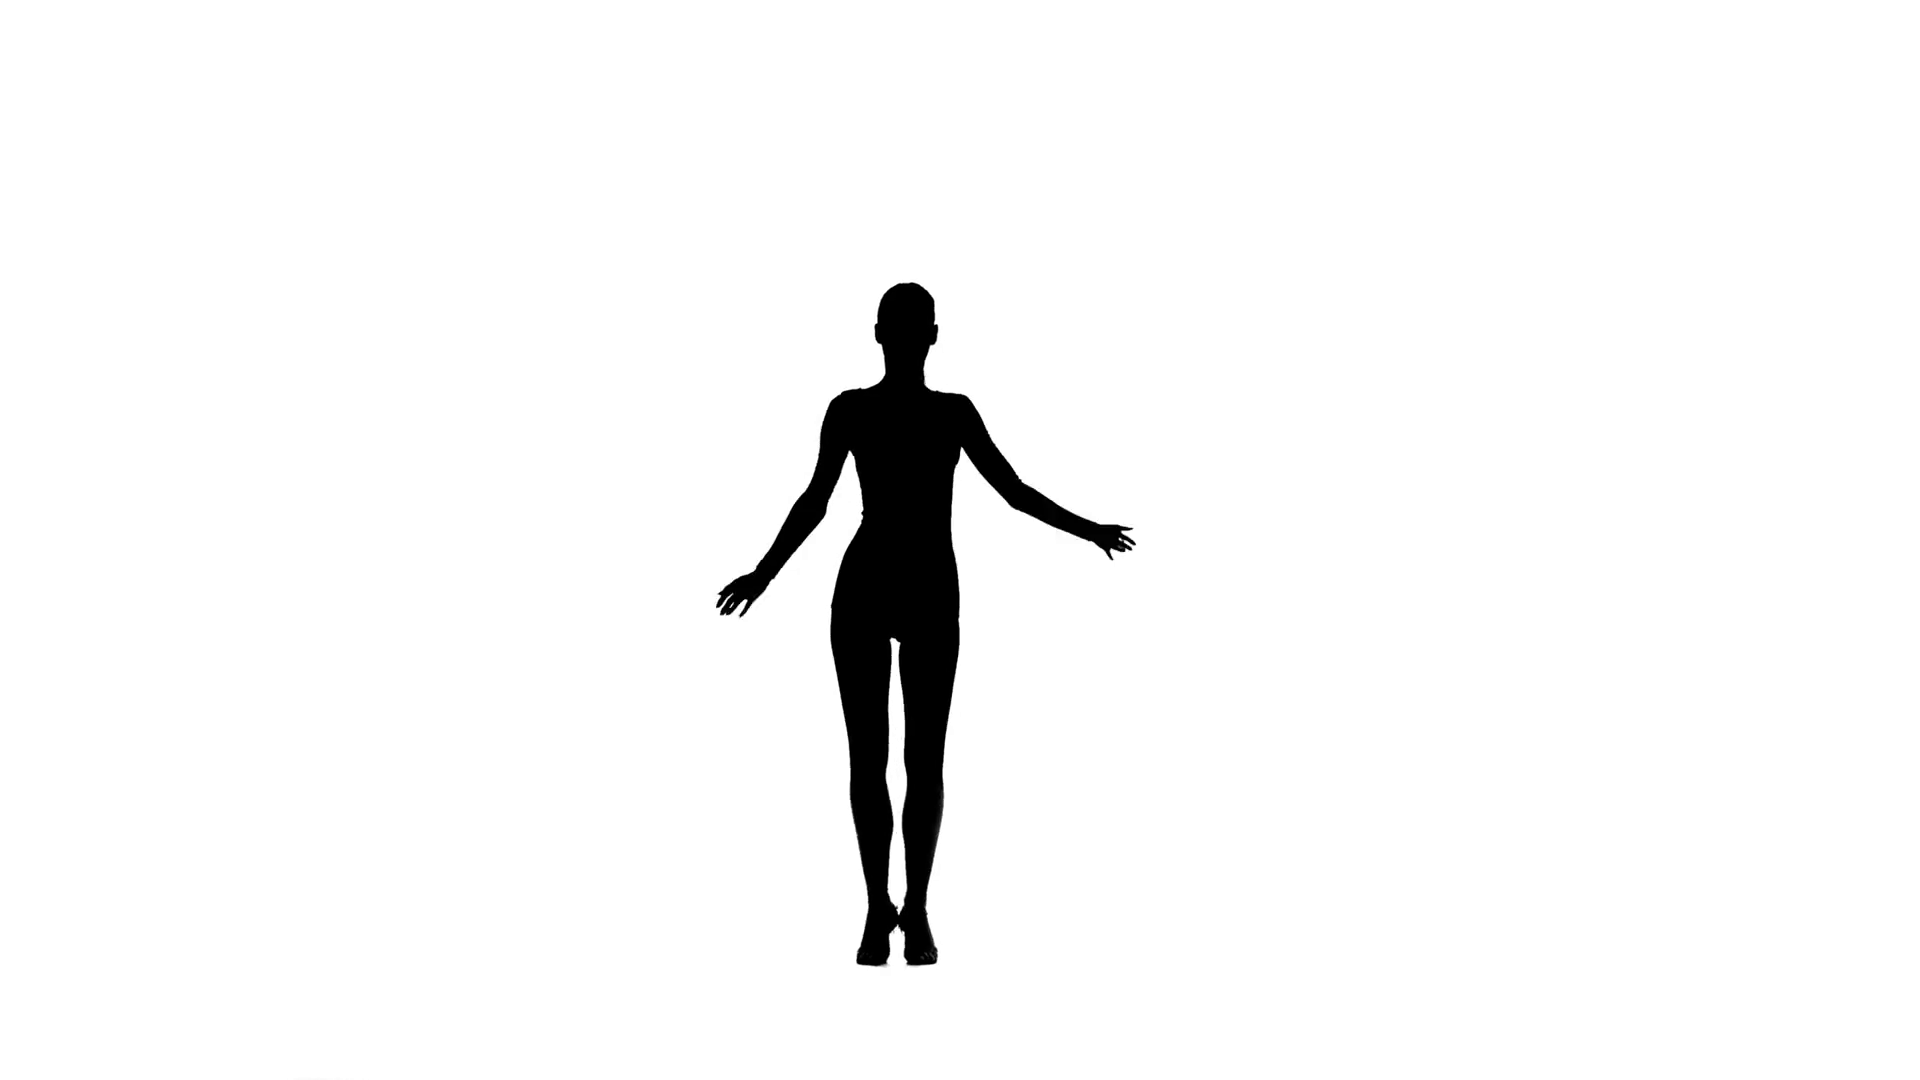 1920x1080 Elegant Woman Dancer Performing Rumba In Silhouette On White